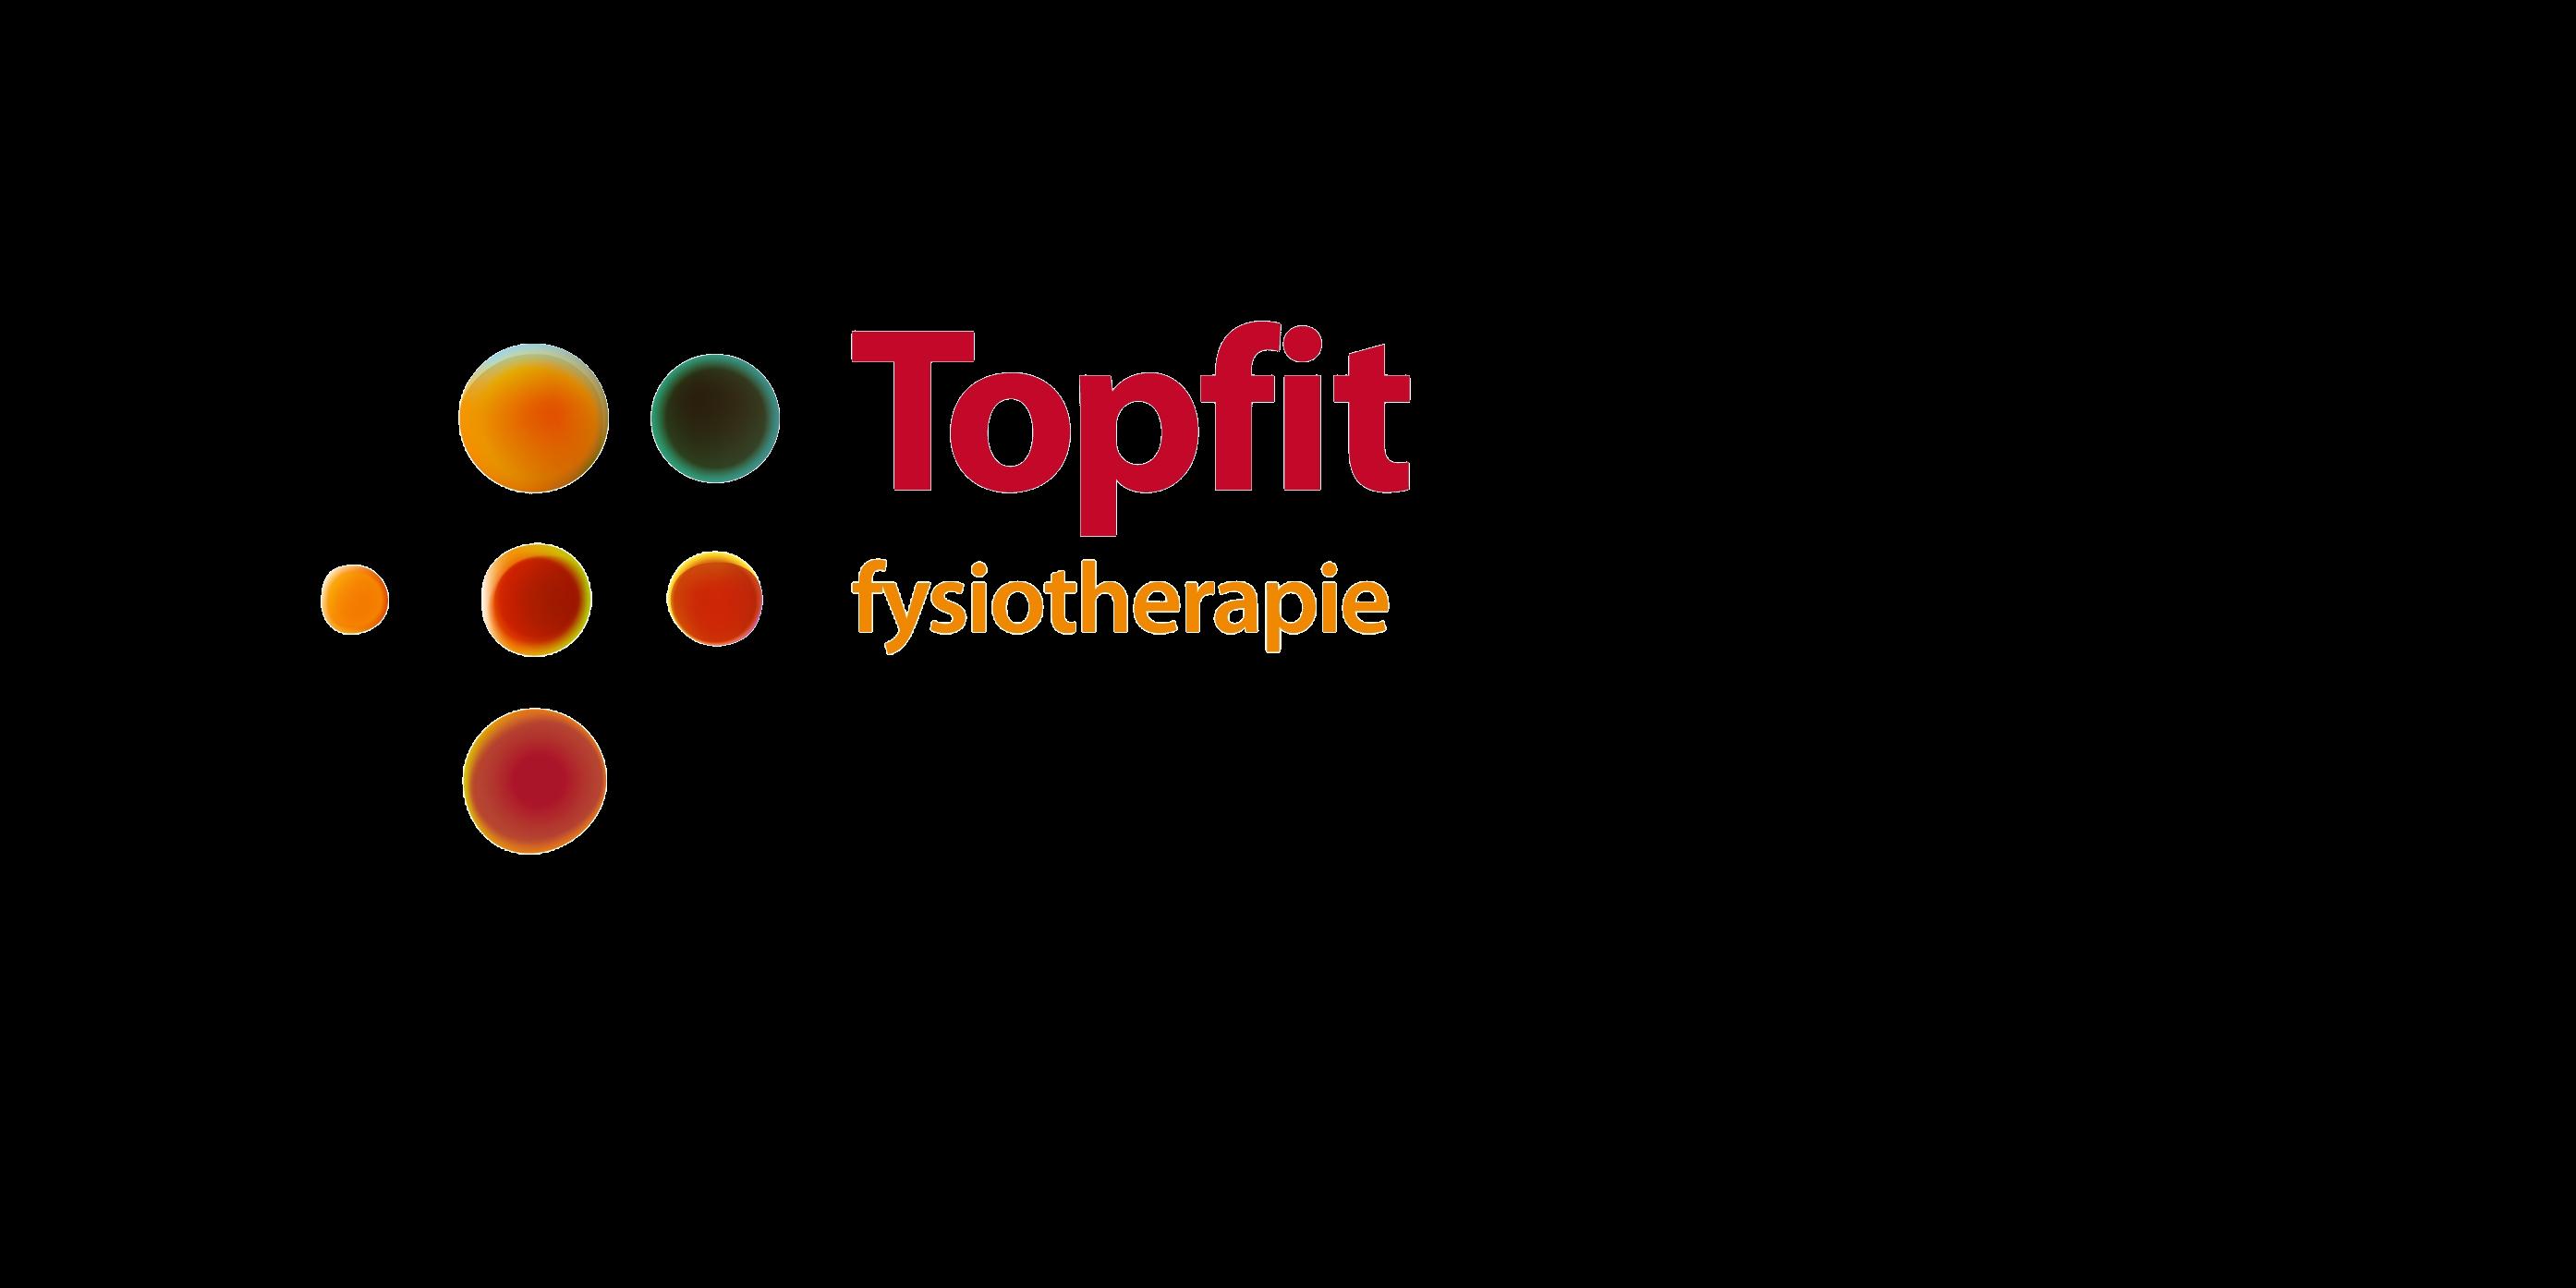 Topfit fysiotherapie